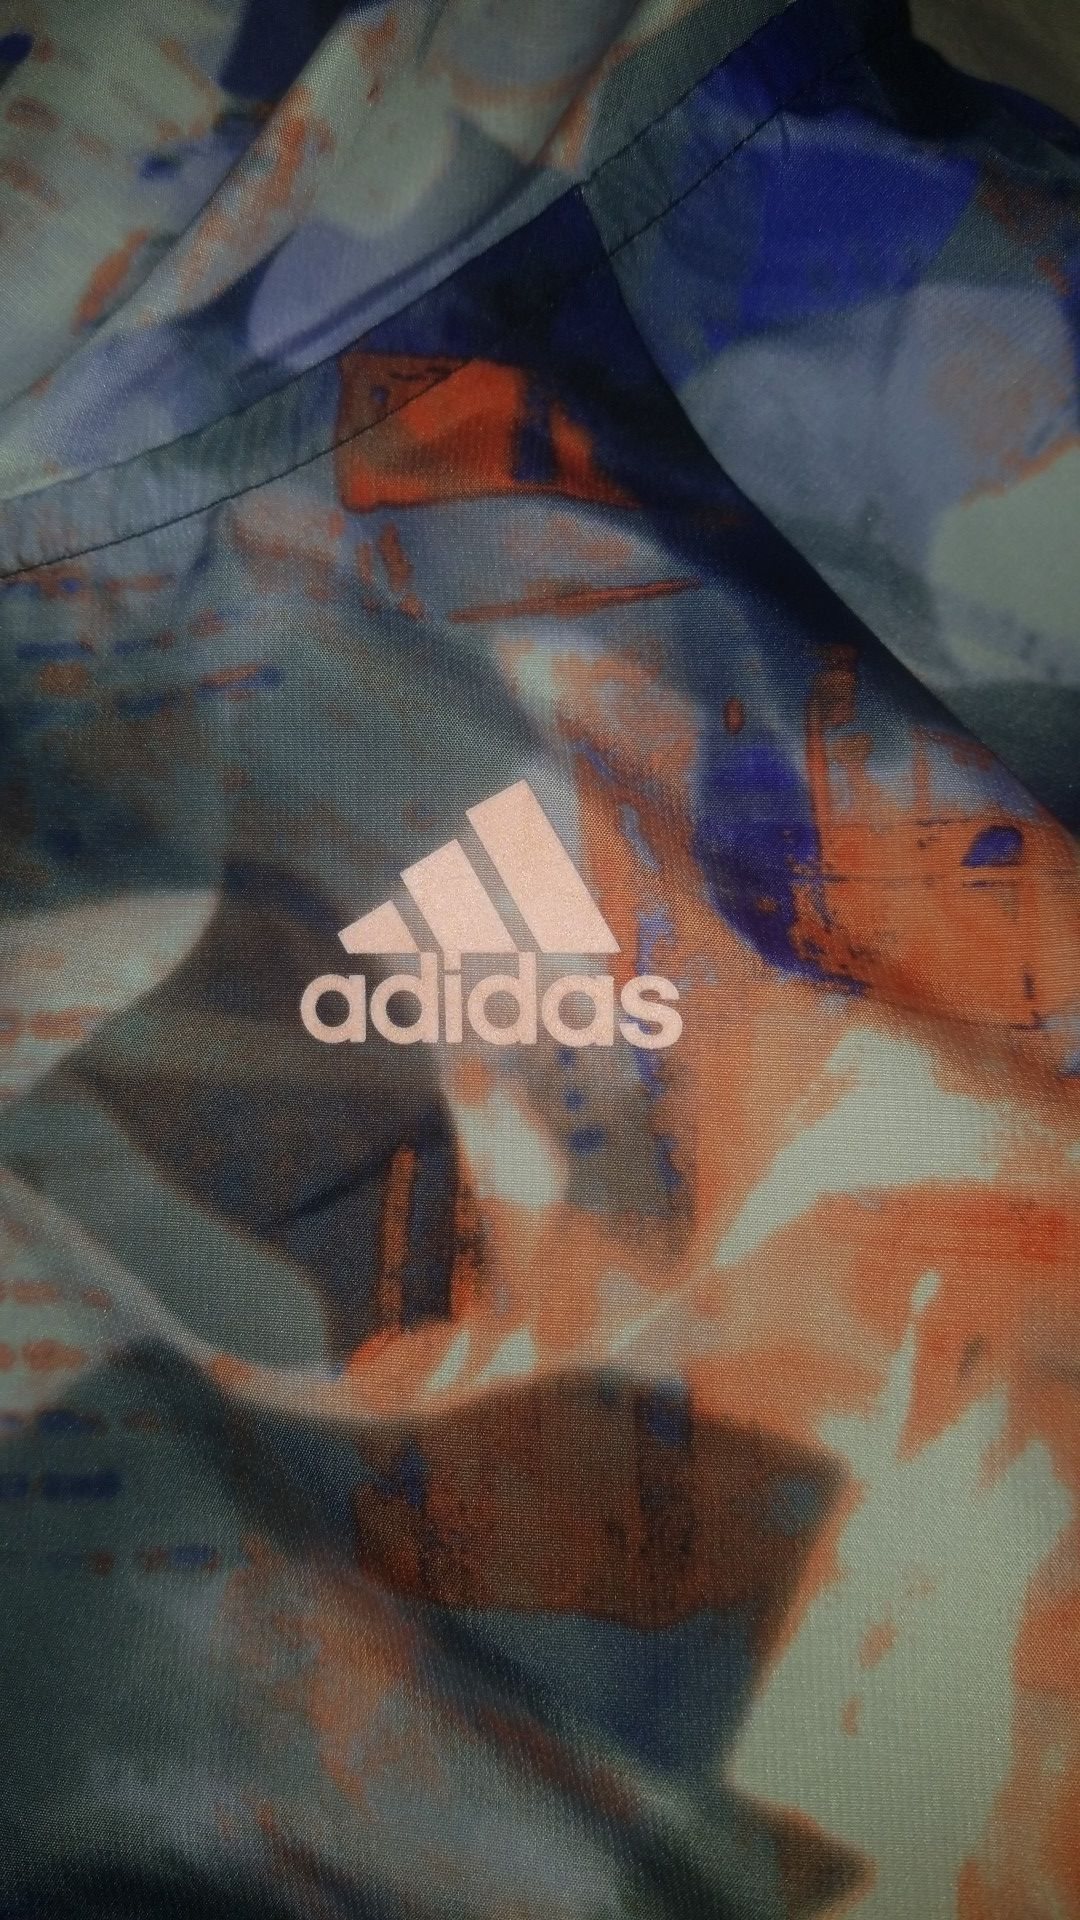 Adidas Windbreaker w/ Matching Shoes $75